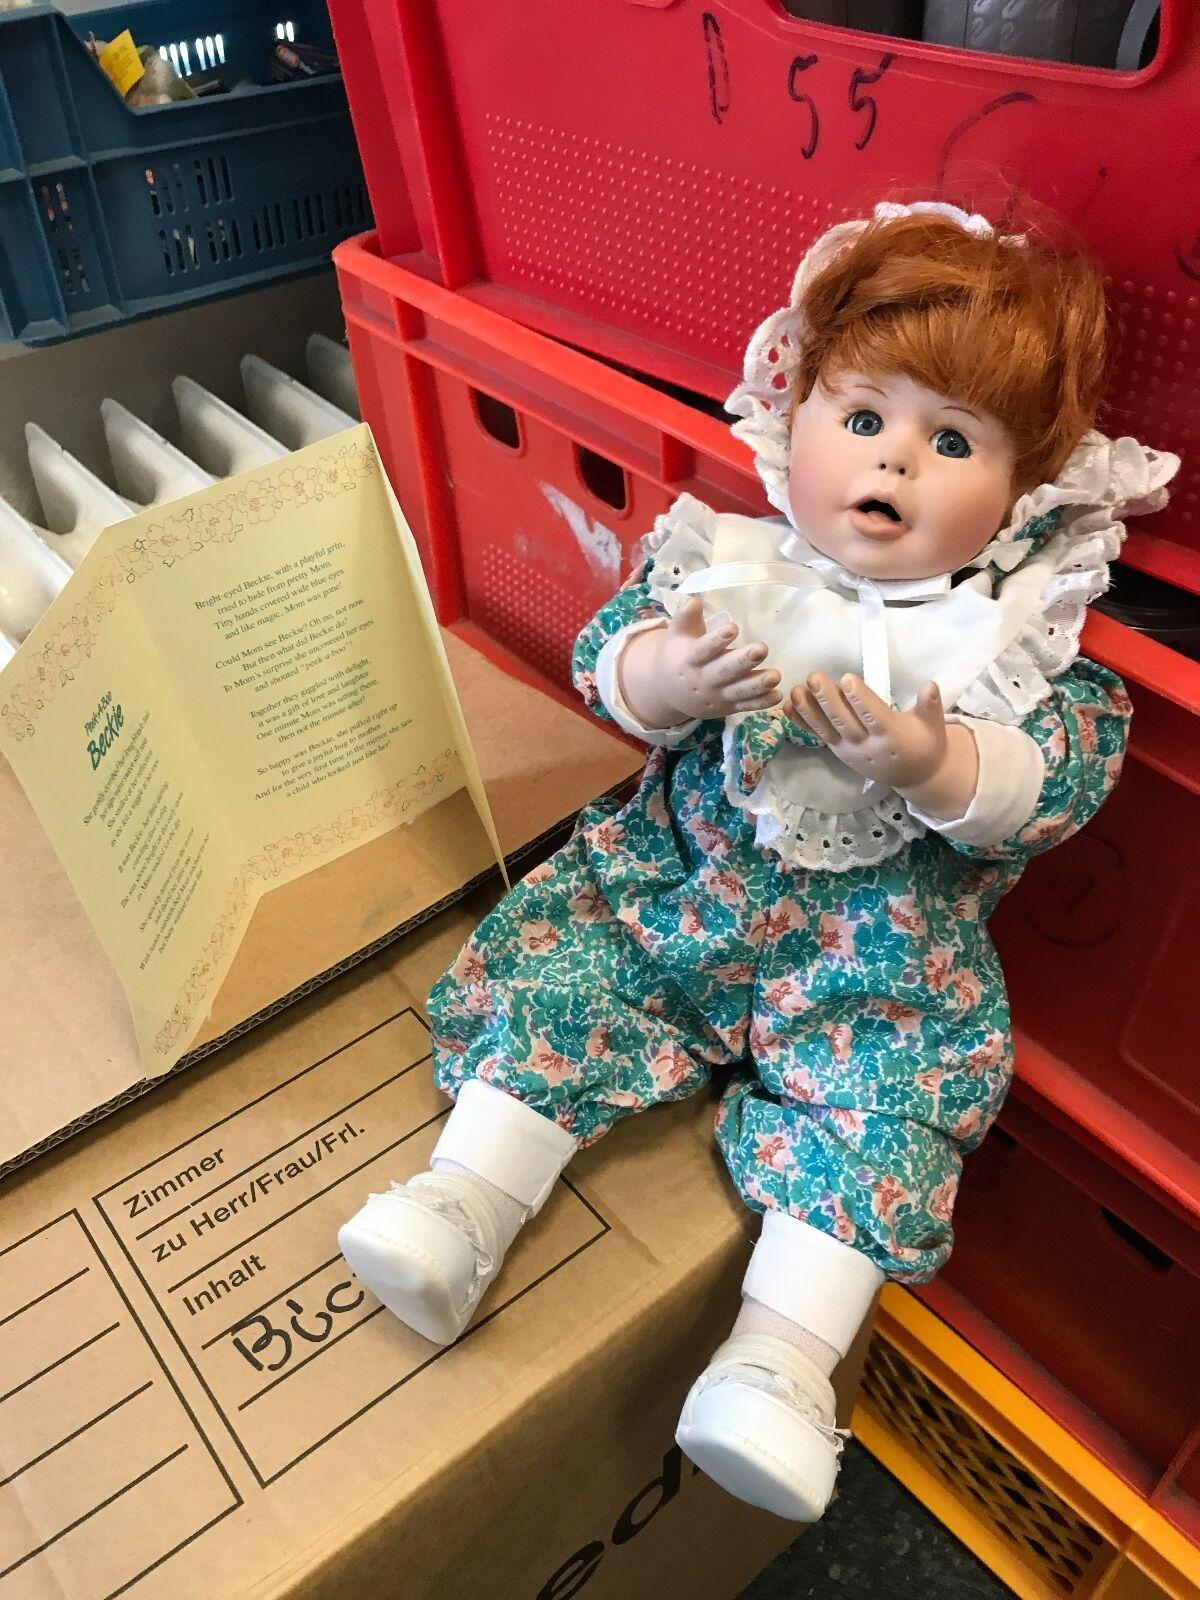 Künstlerpuppe Porzellan Puppe 35 cm. Top Zustand